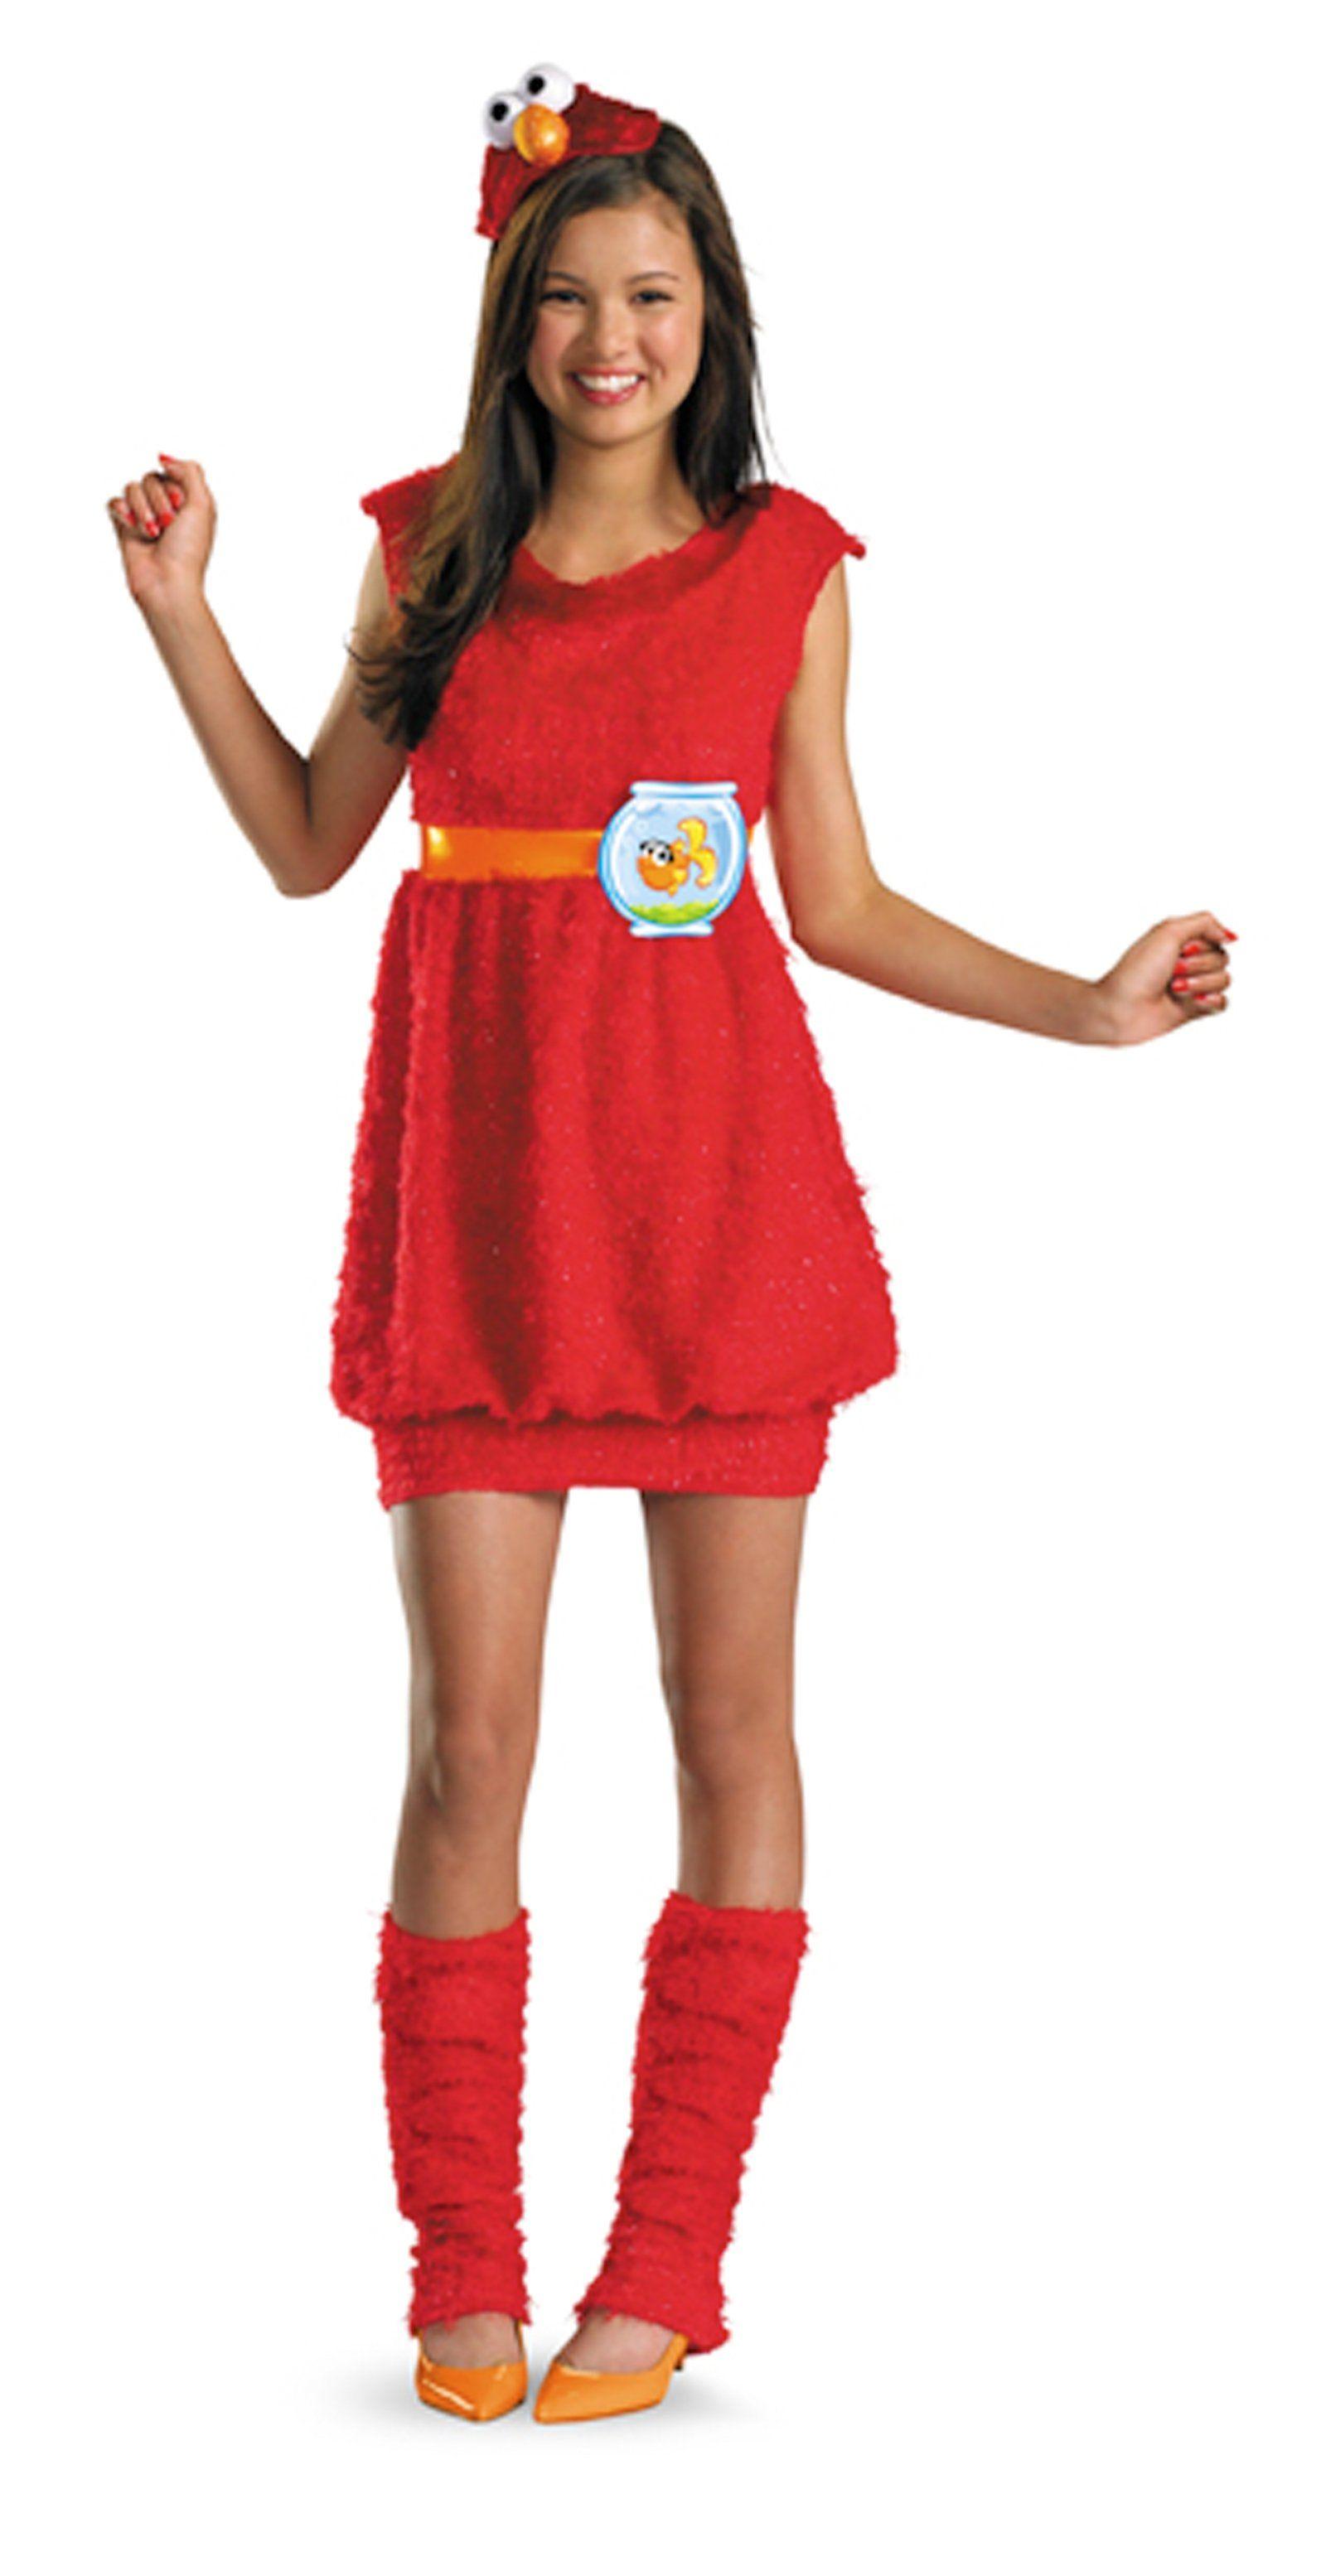 Girls Sesame Street Elmo Costume | Costumes, Elmo and Halloween costumes